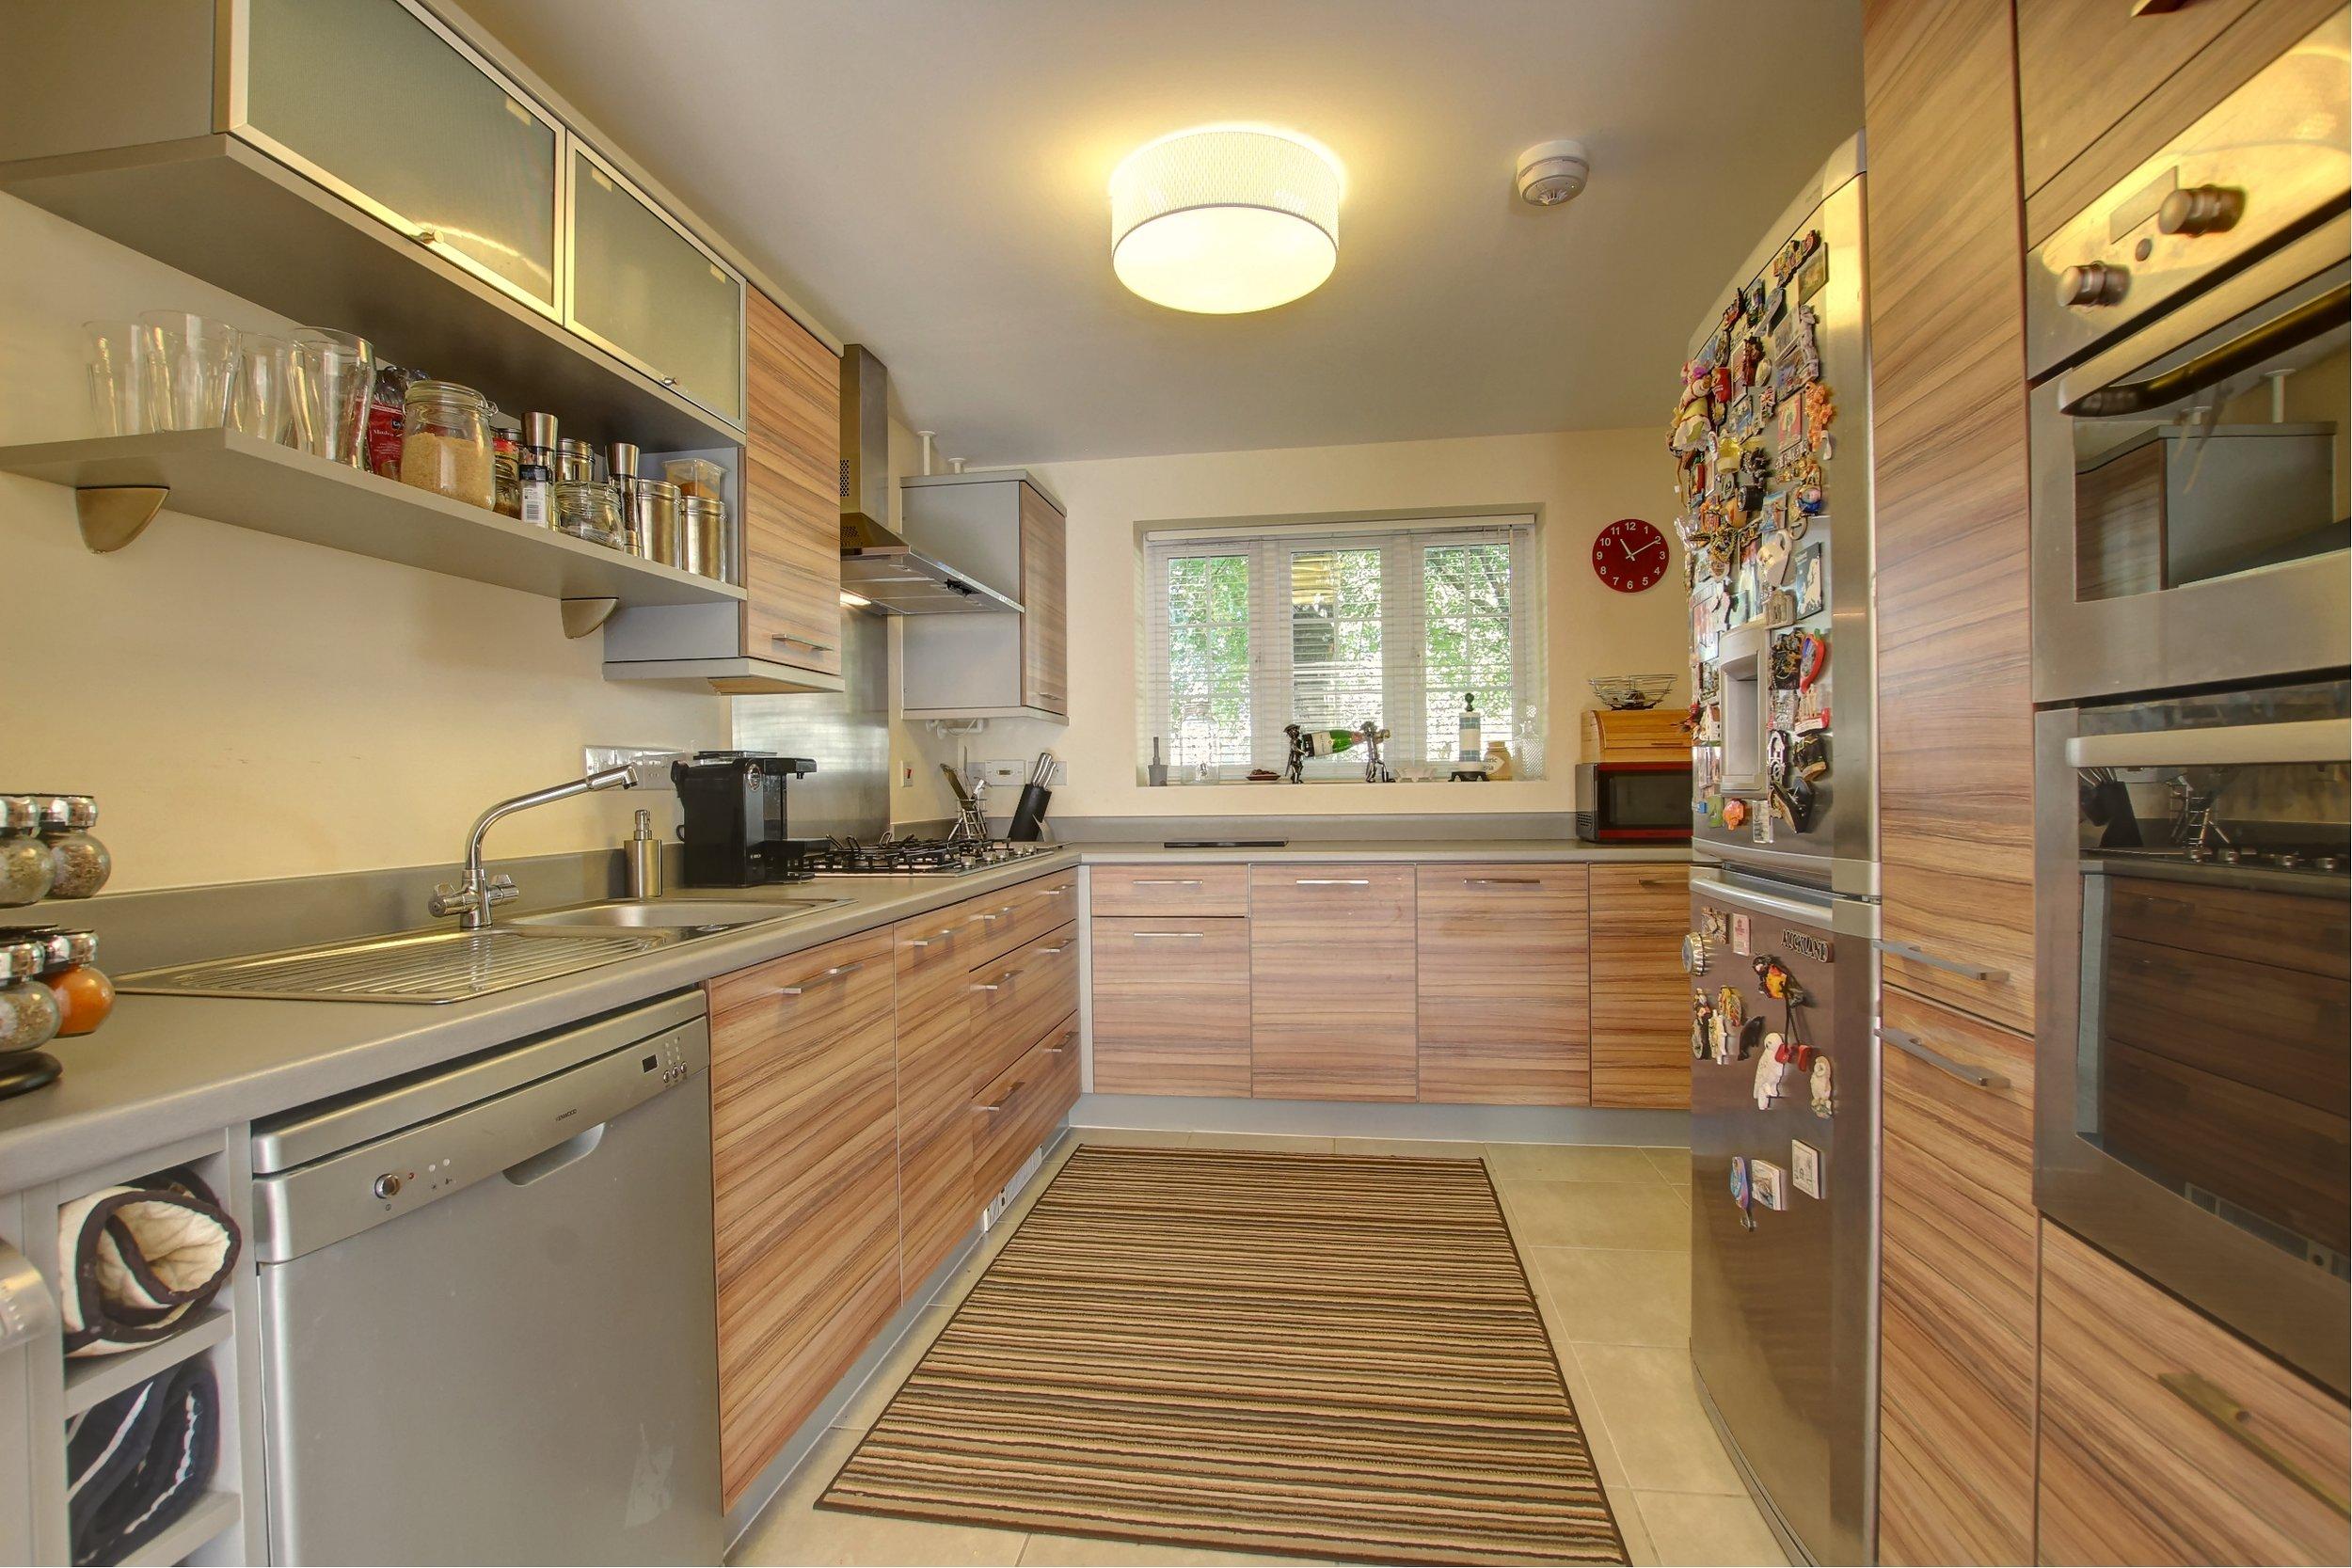 13 kitchen i.jpg